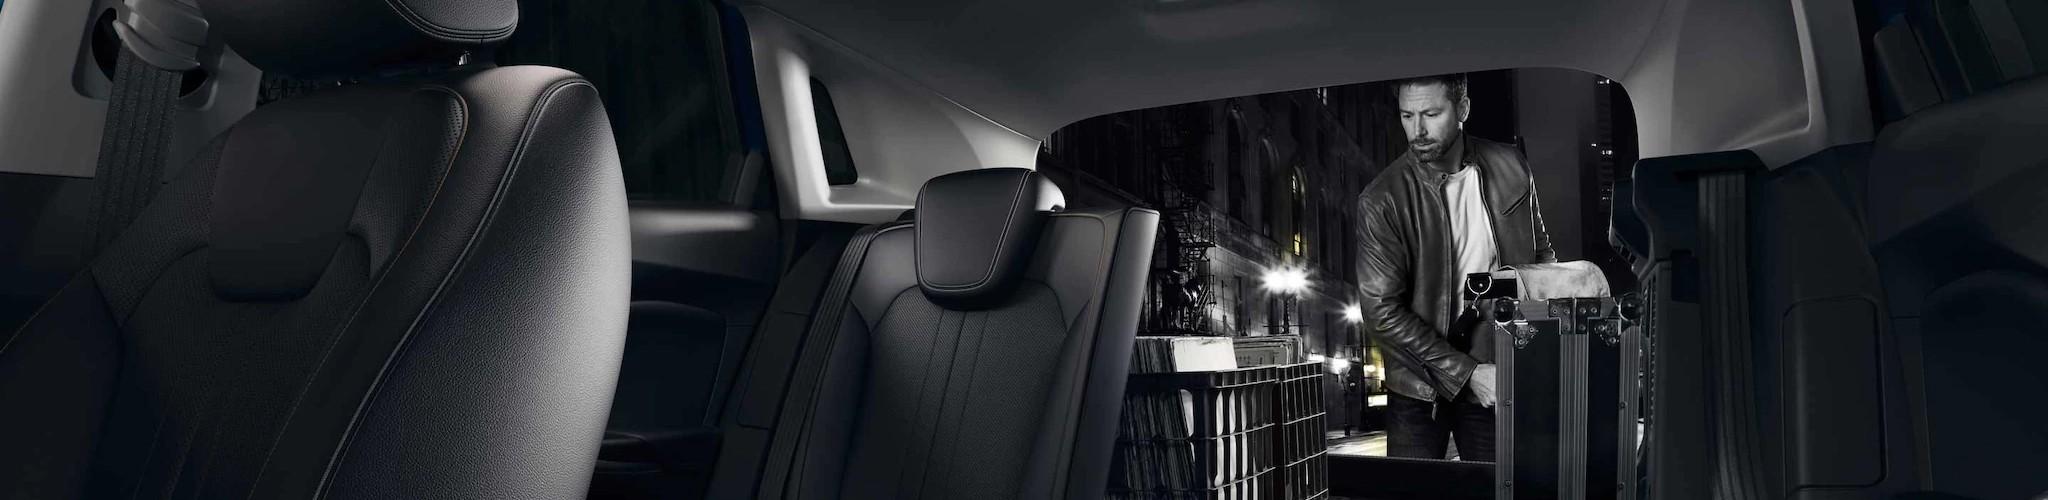 Opel_grandland_x_interior_4